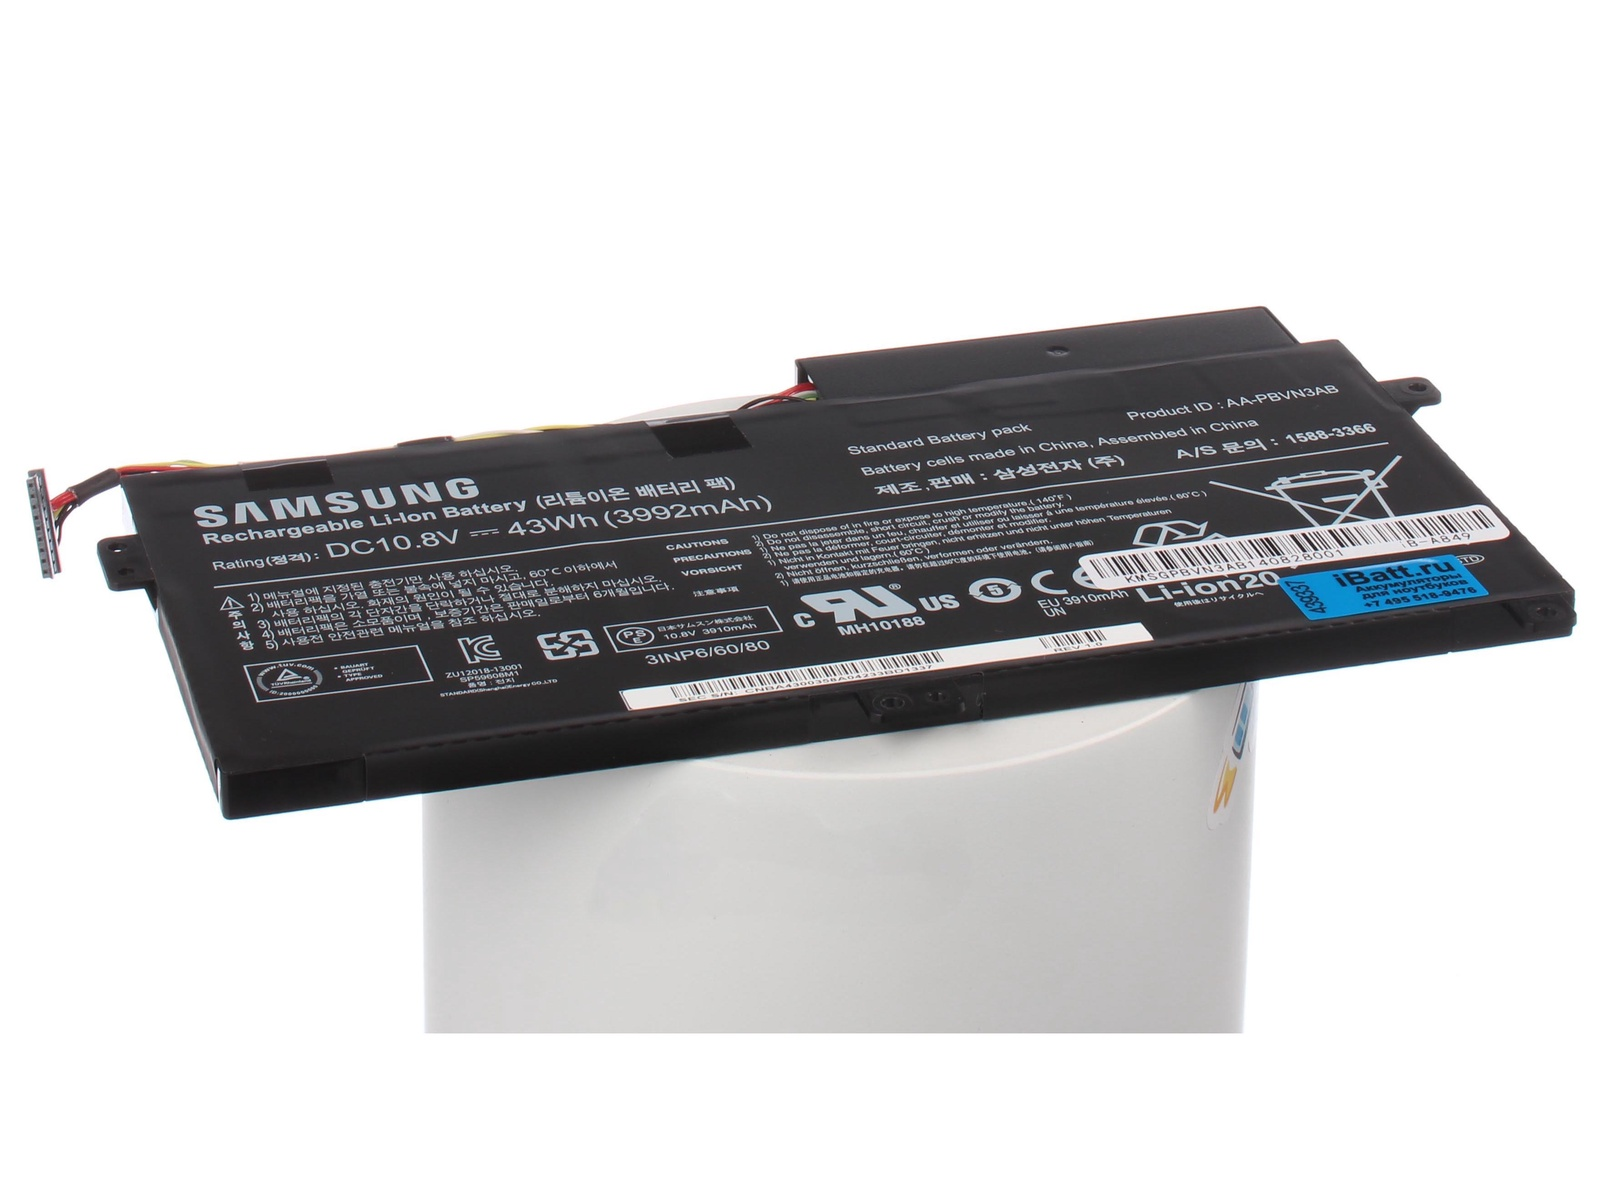 Аккумулятор для ноутбука iBatt Samsung AA-PBVN3AB, CS-SNP470NB скачать драйвера для ноутбука samsung